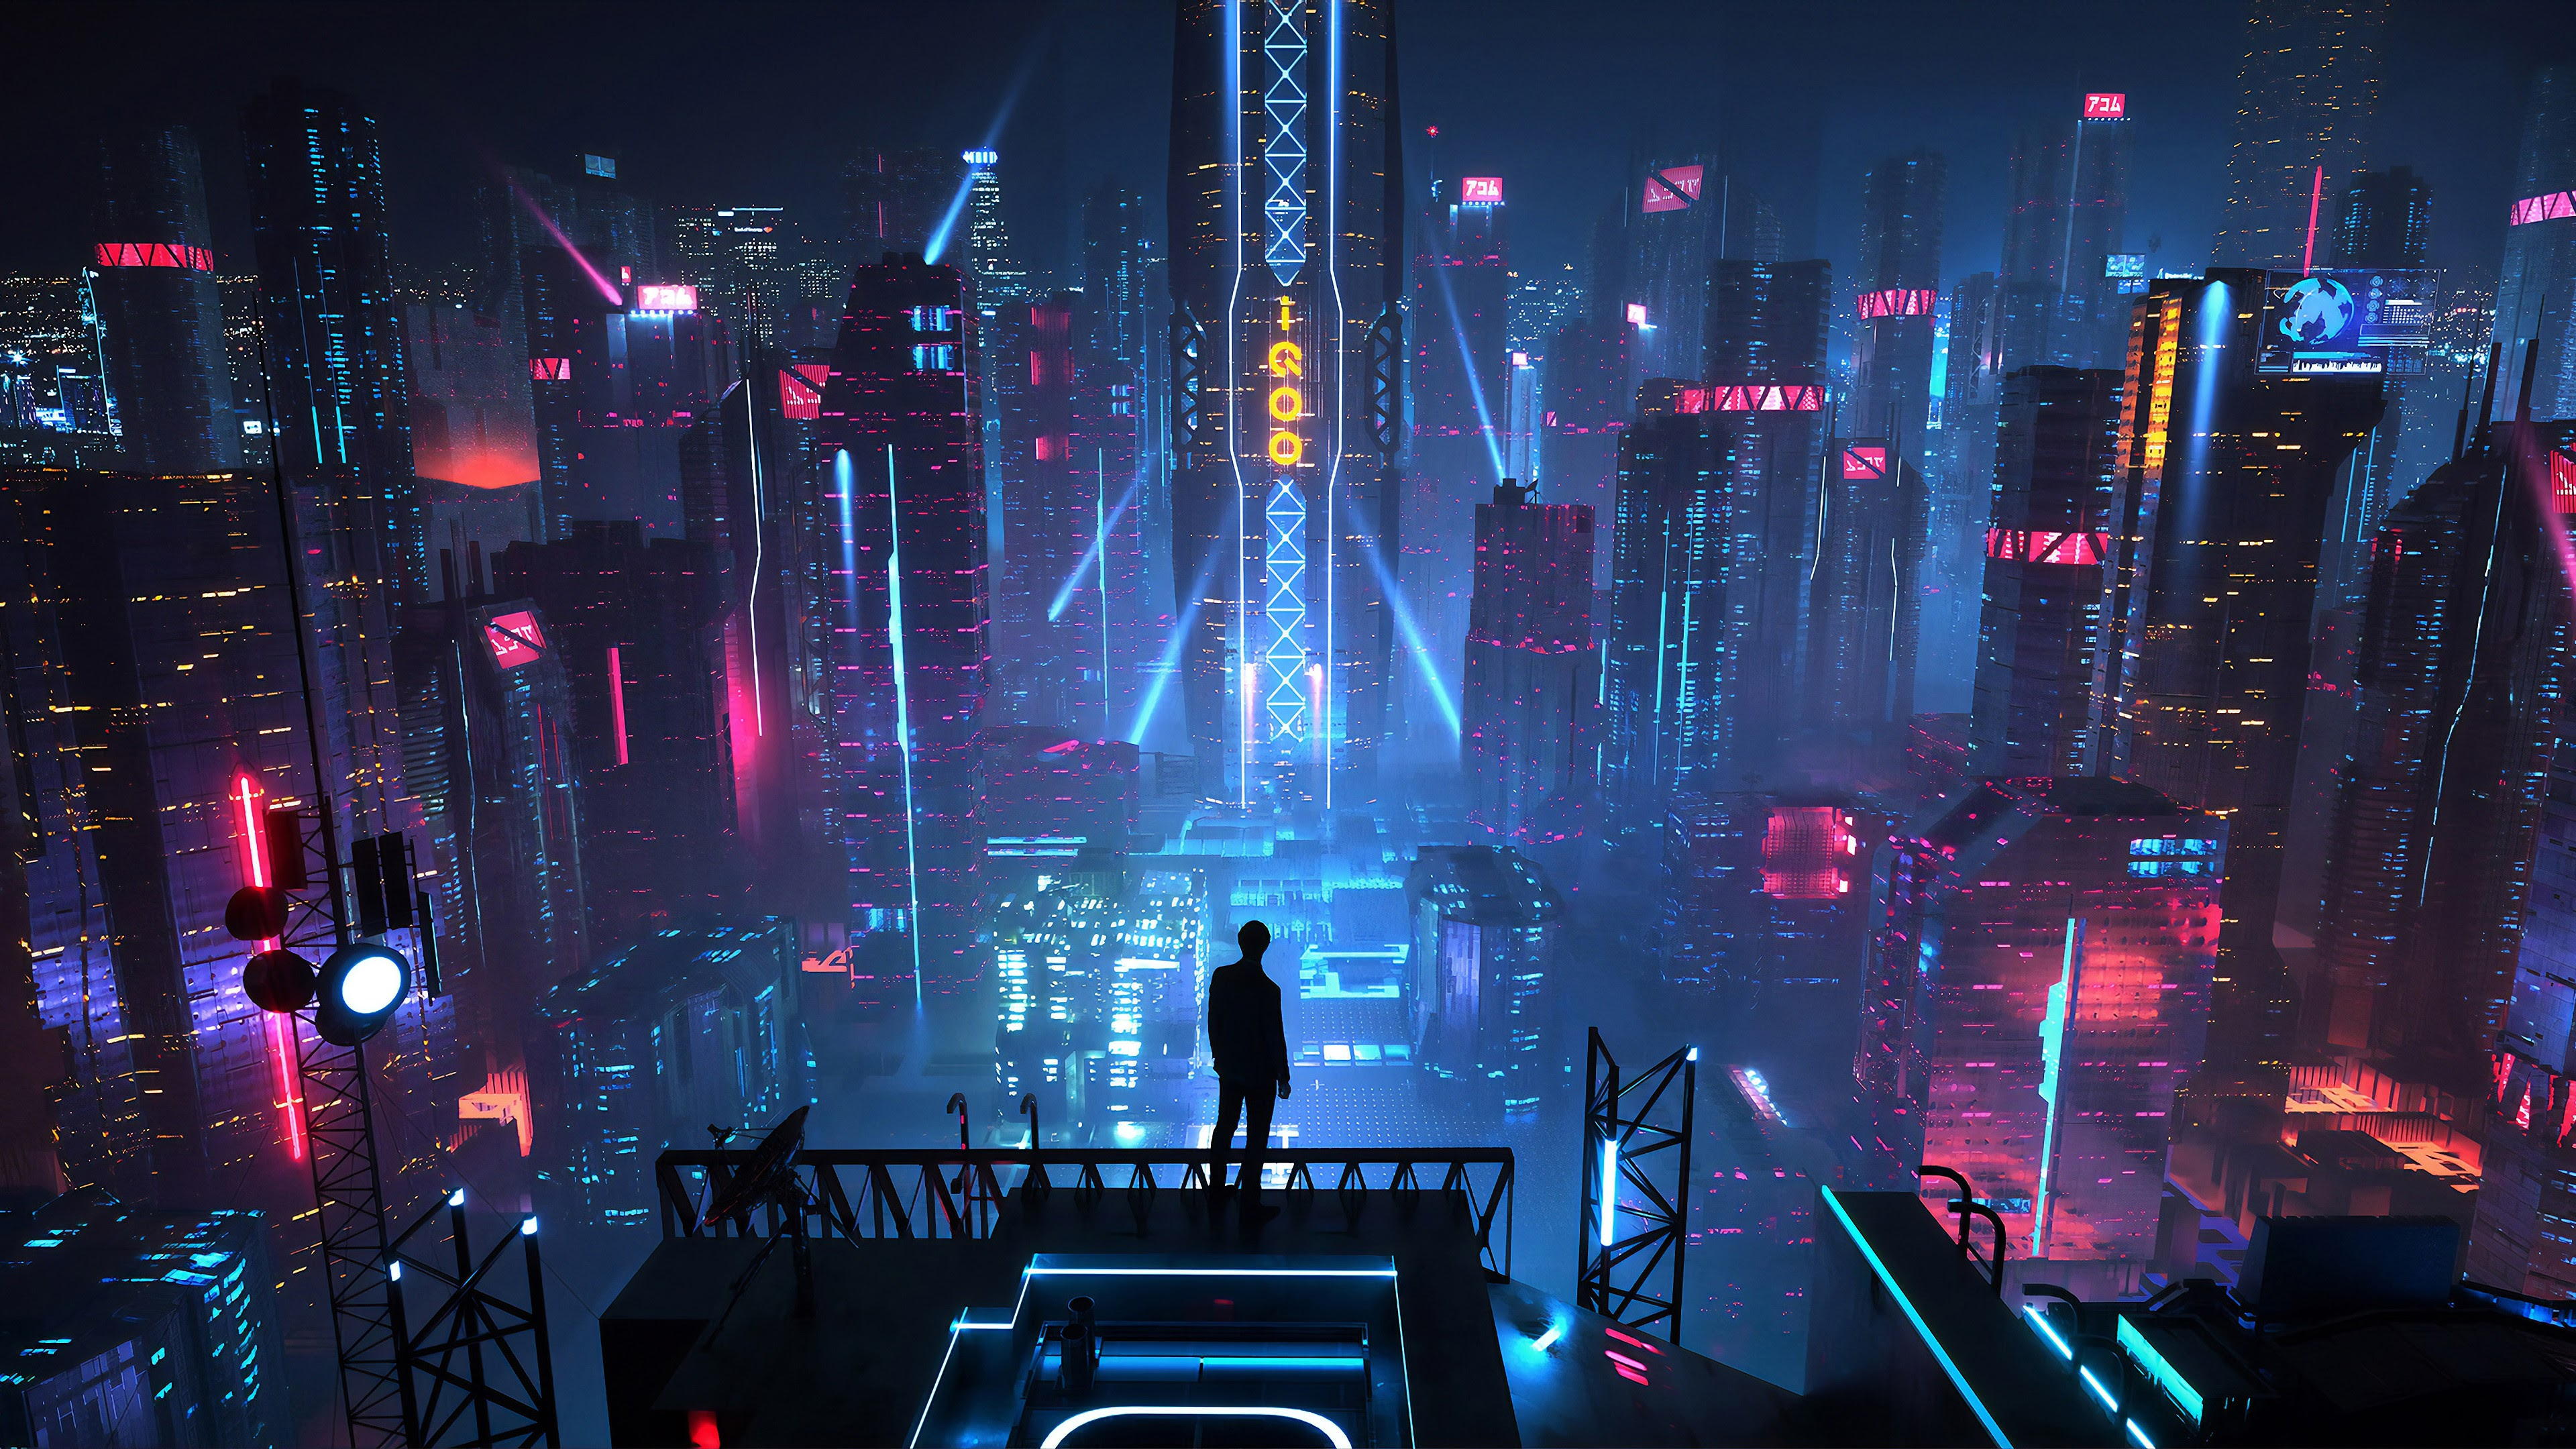 Sci Fi City Buildings Night Cityscape 4k 142 Wallpaper